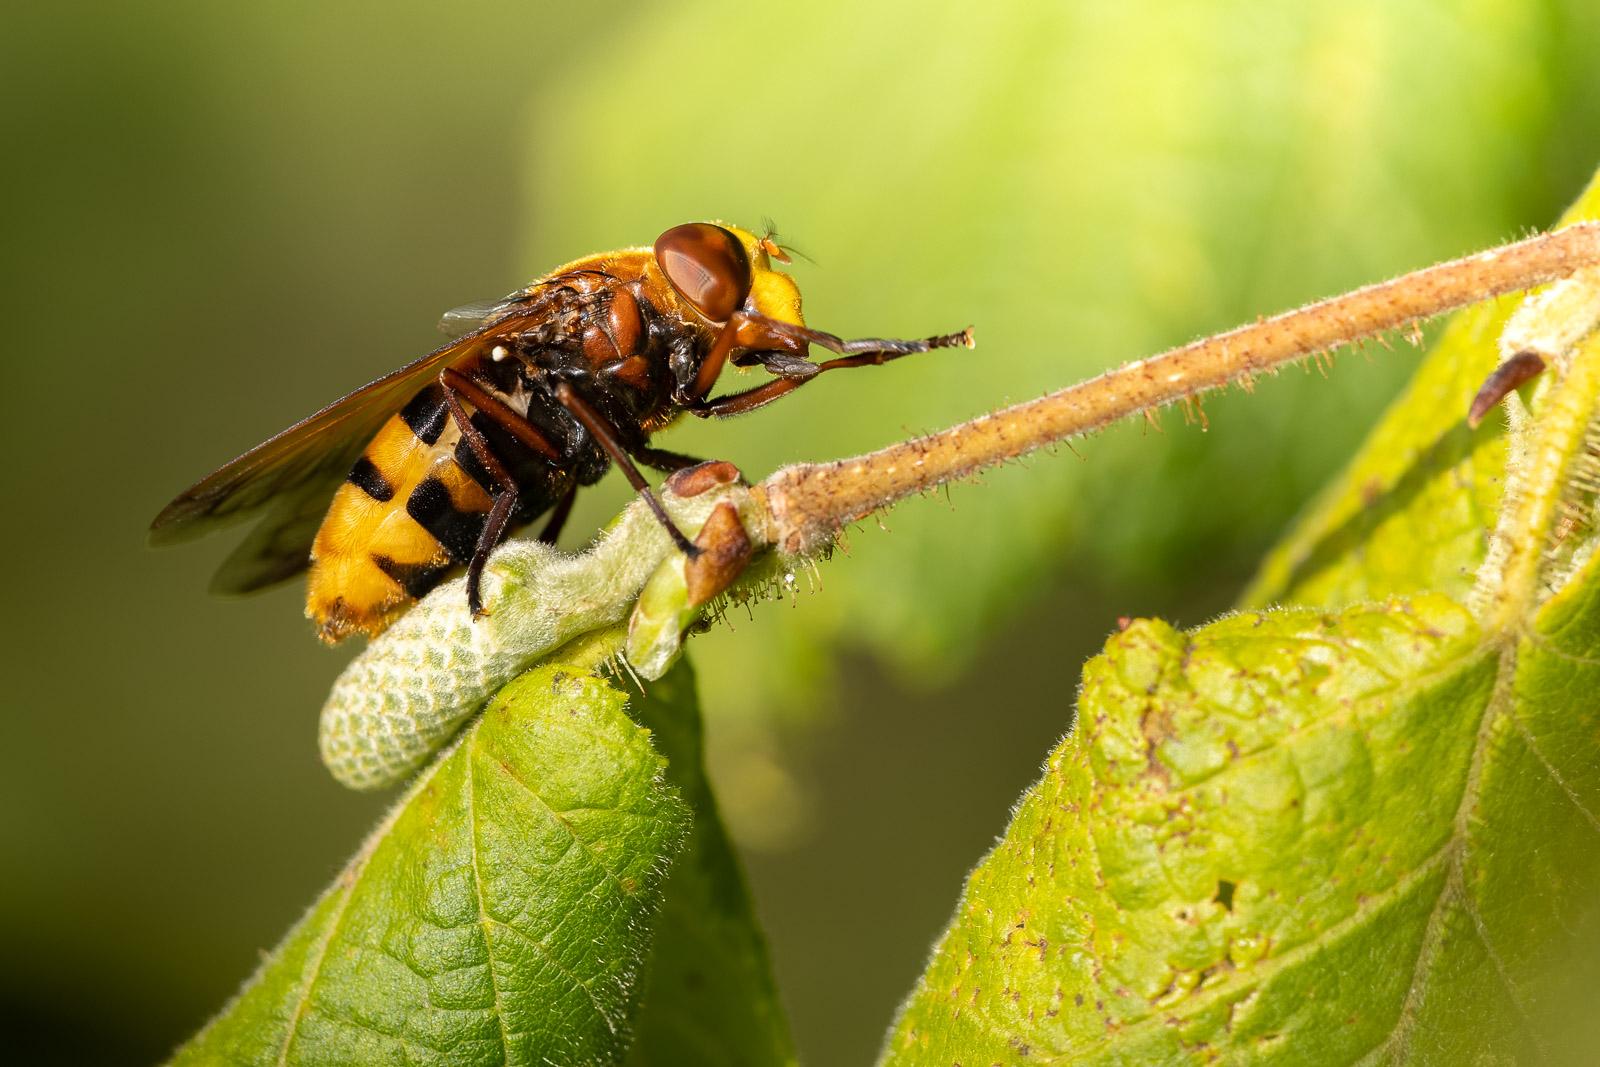 Hornet mimic hoverfly (Volucella zonaria) - Lynchcombe, Mendip Hills, Somerset, UK. ID BR54570